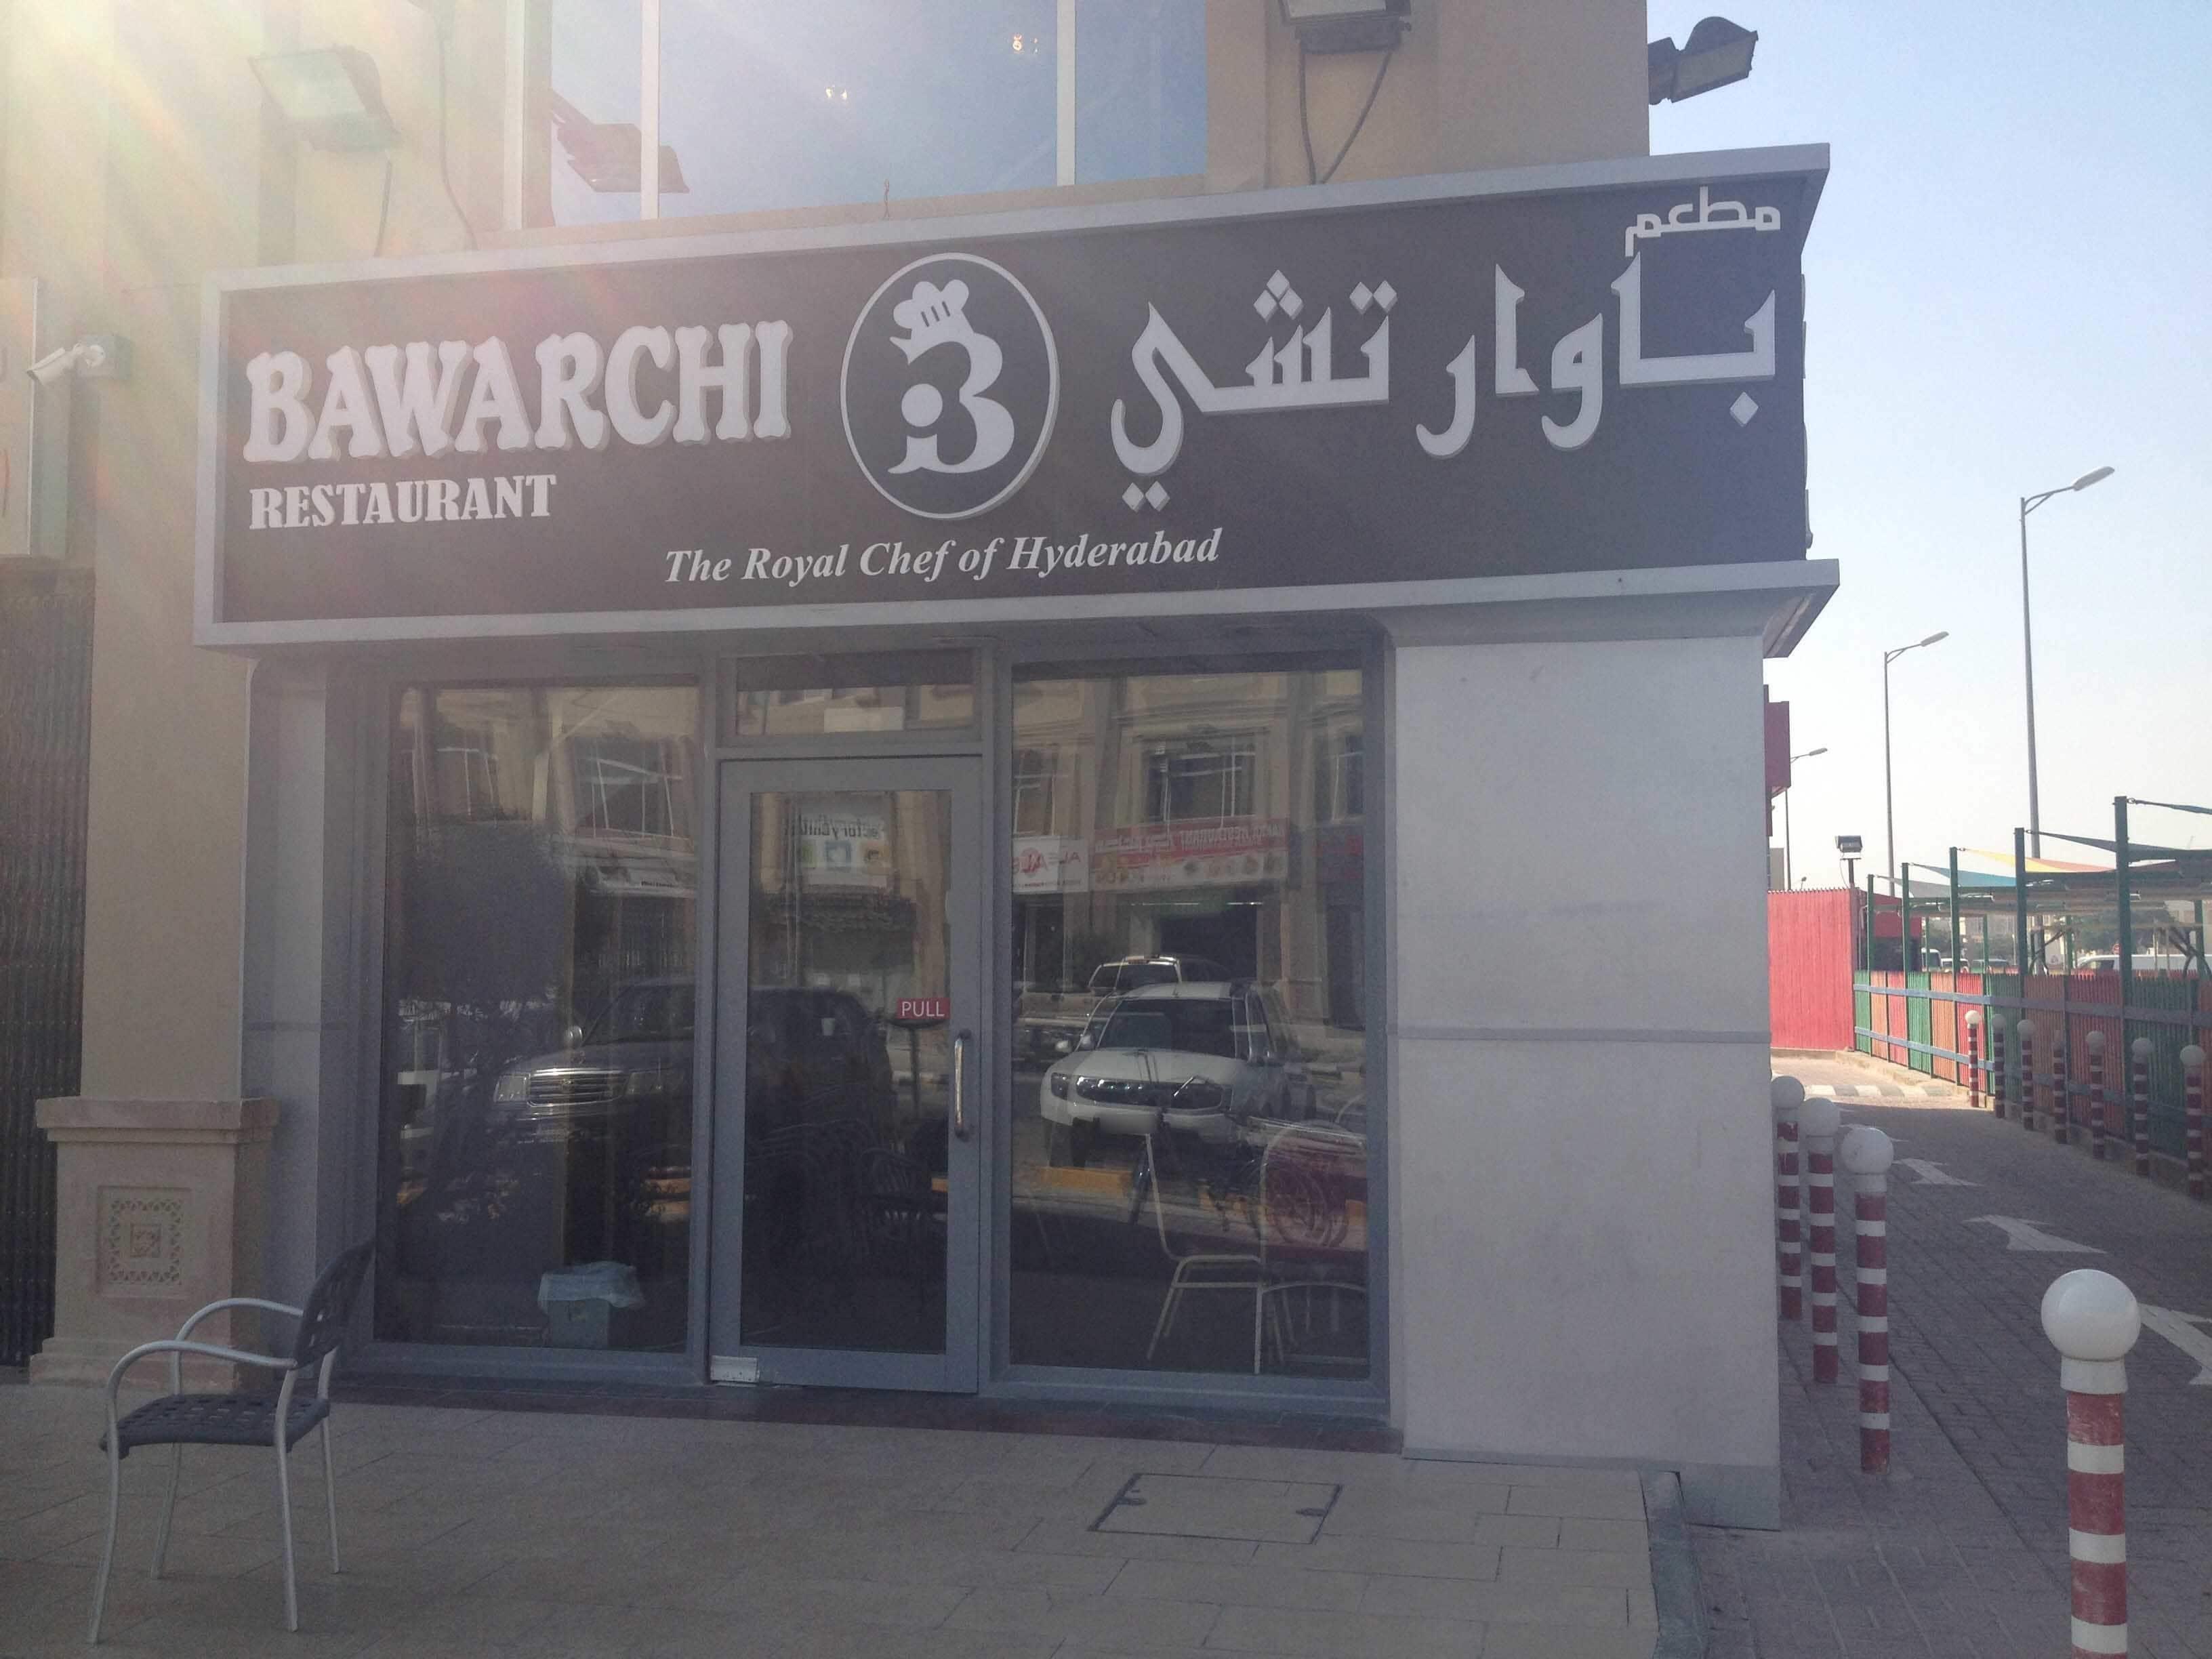 Bawarchi Restaurant, Barwa Village, Doha